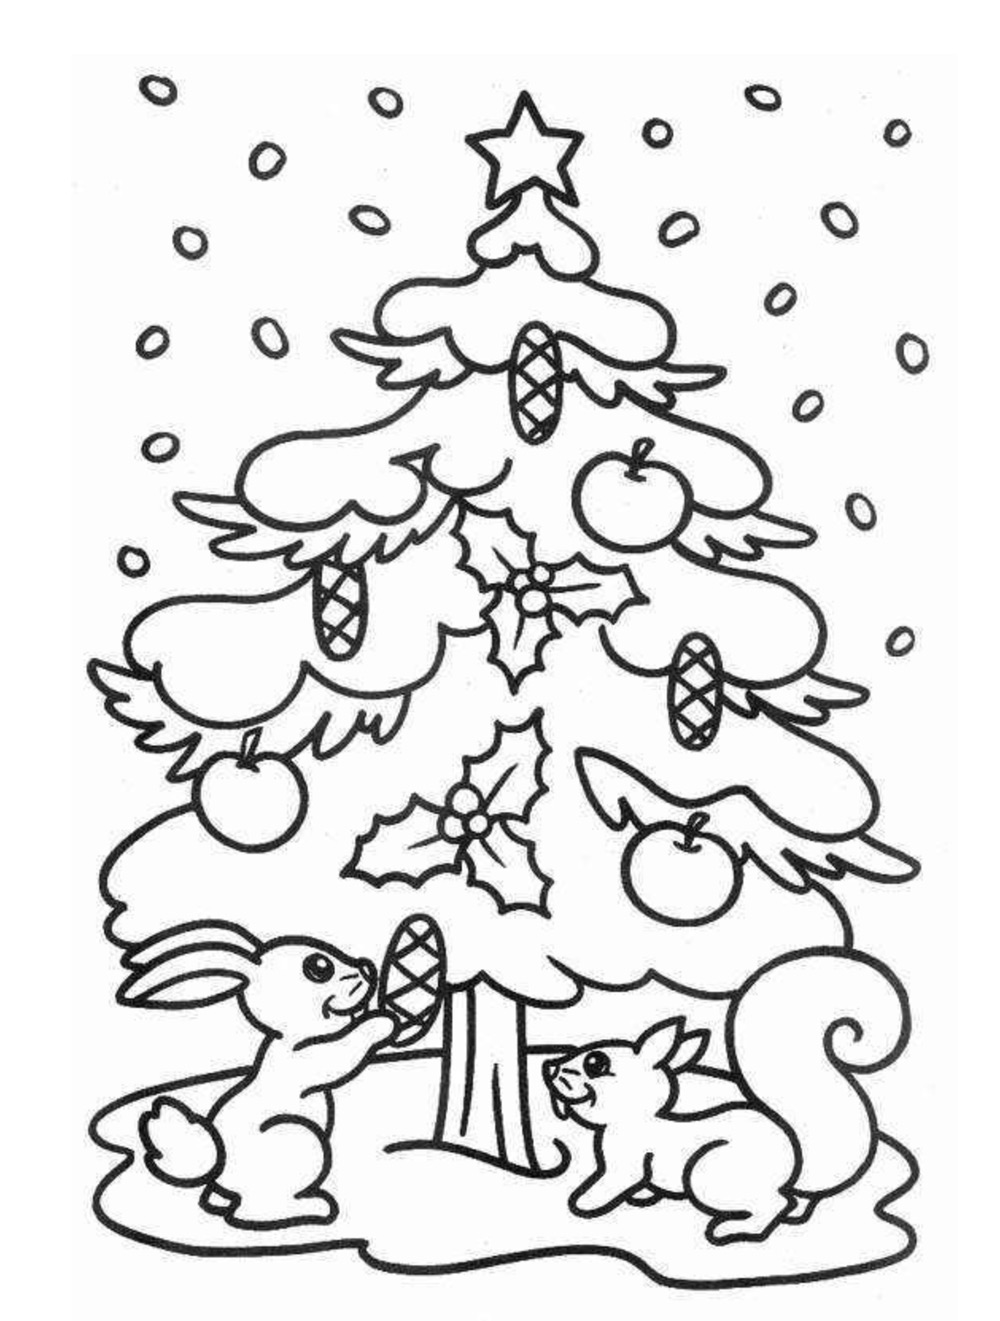 Dibujos navidad para imprimir